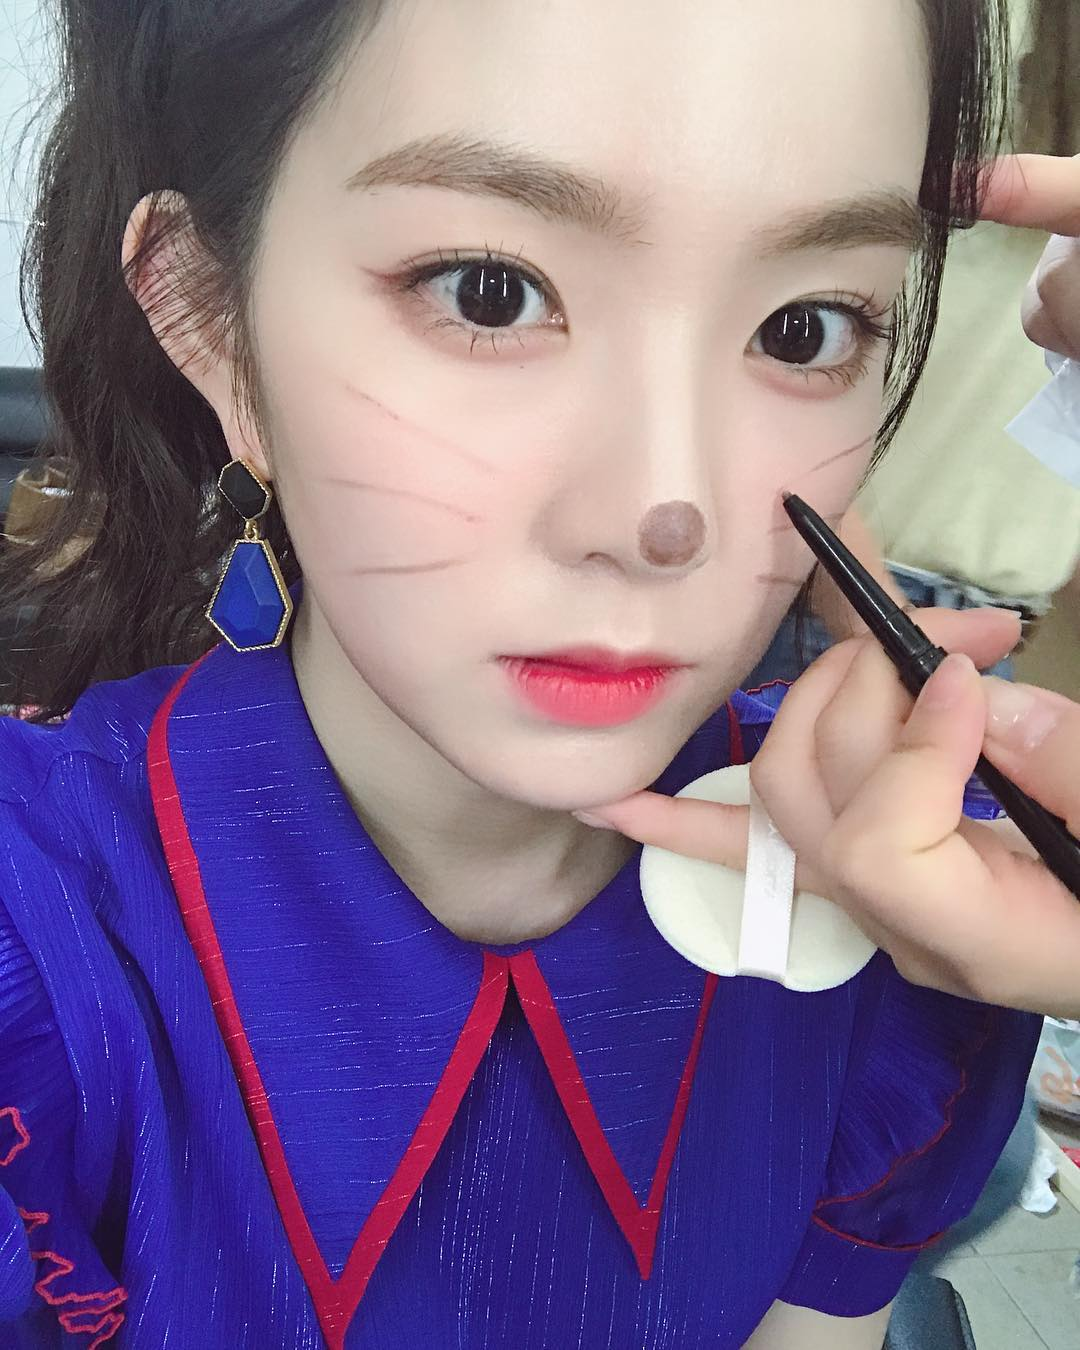 #Red Velvet Irene Irene不只容易受到驚嚇,怕動物、怕水又怕高,而且還怕生的她,難怪會想要待在家裡啊!(Irene是有名的宅精靈之一)